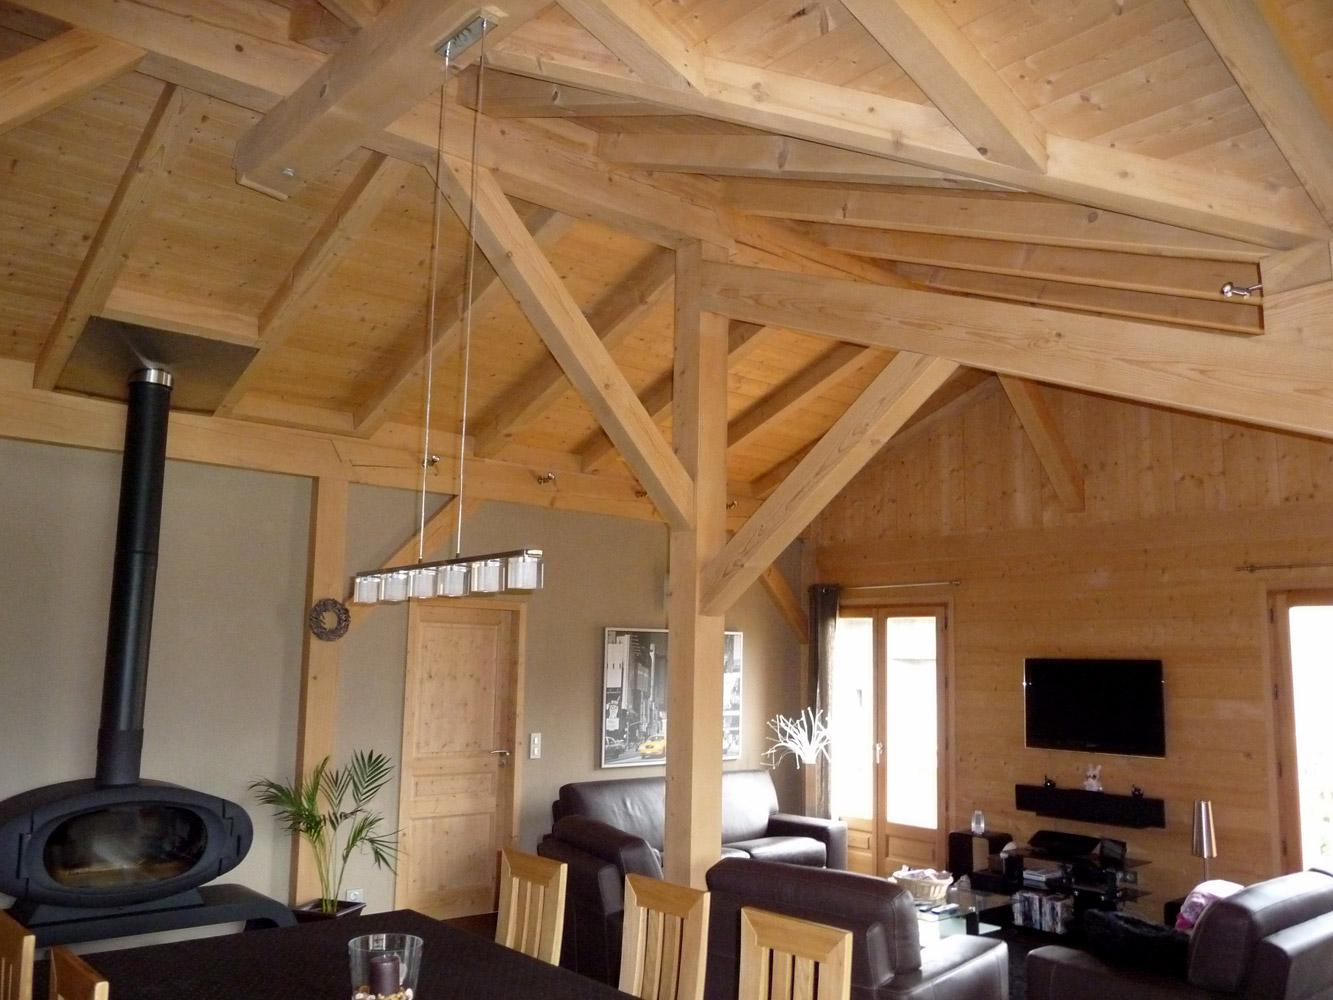 charpente bois apparente qx91 humatraffin. Black Bedroom Furniture Sets. Home Design Ideas